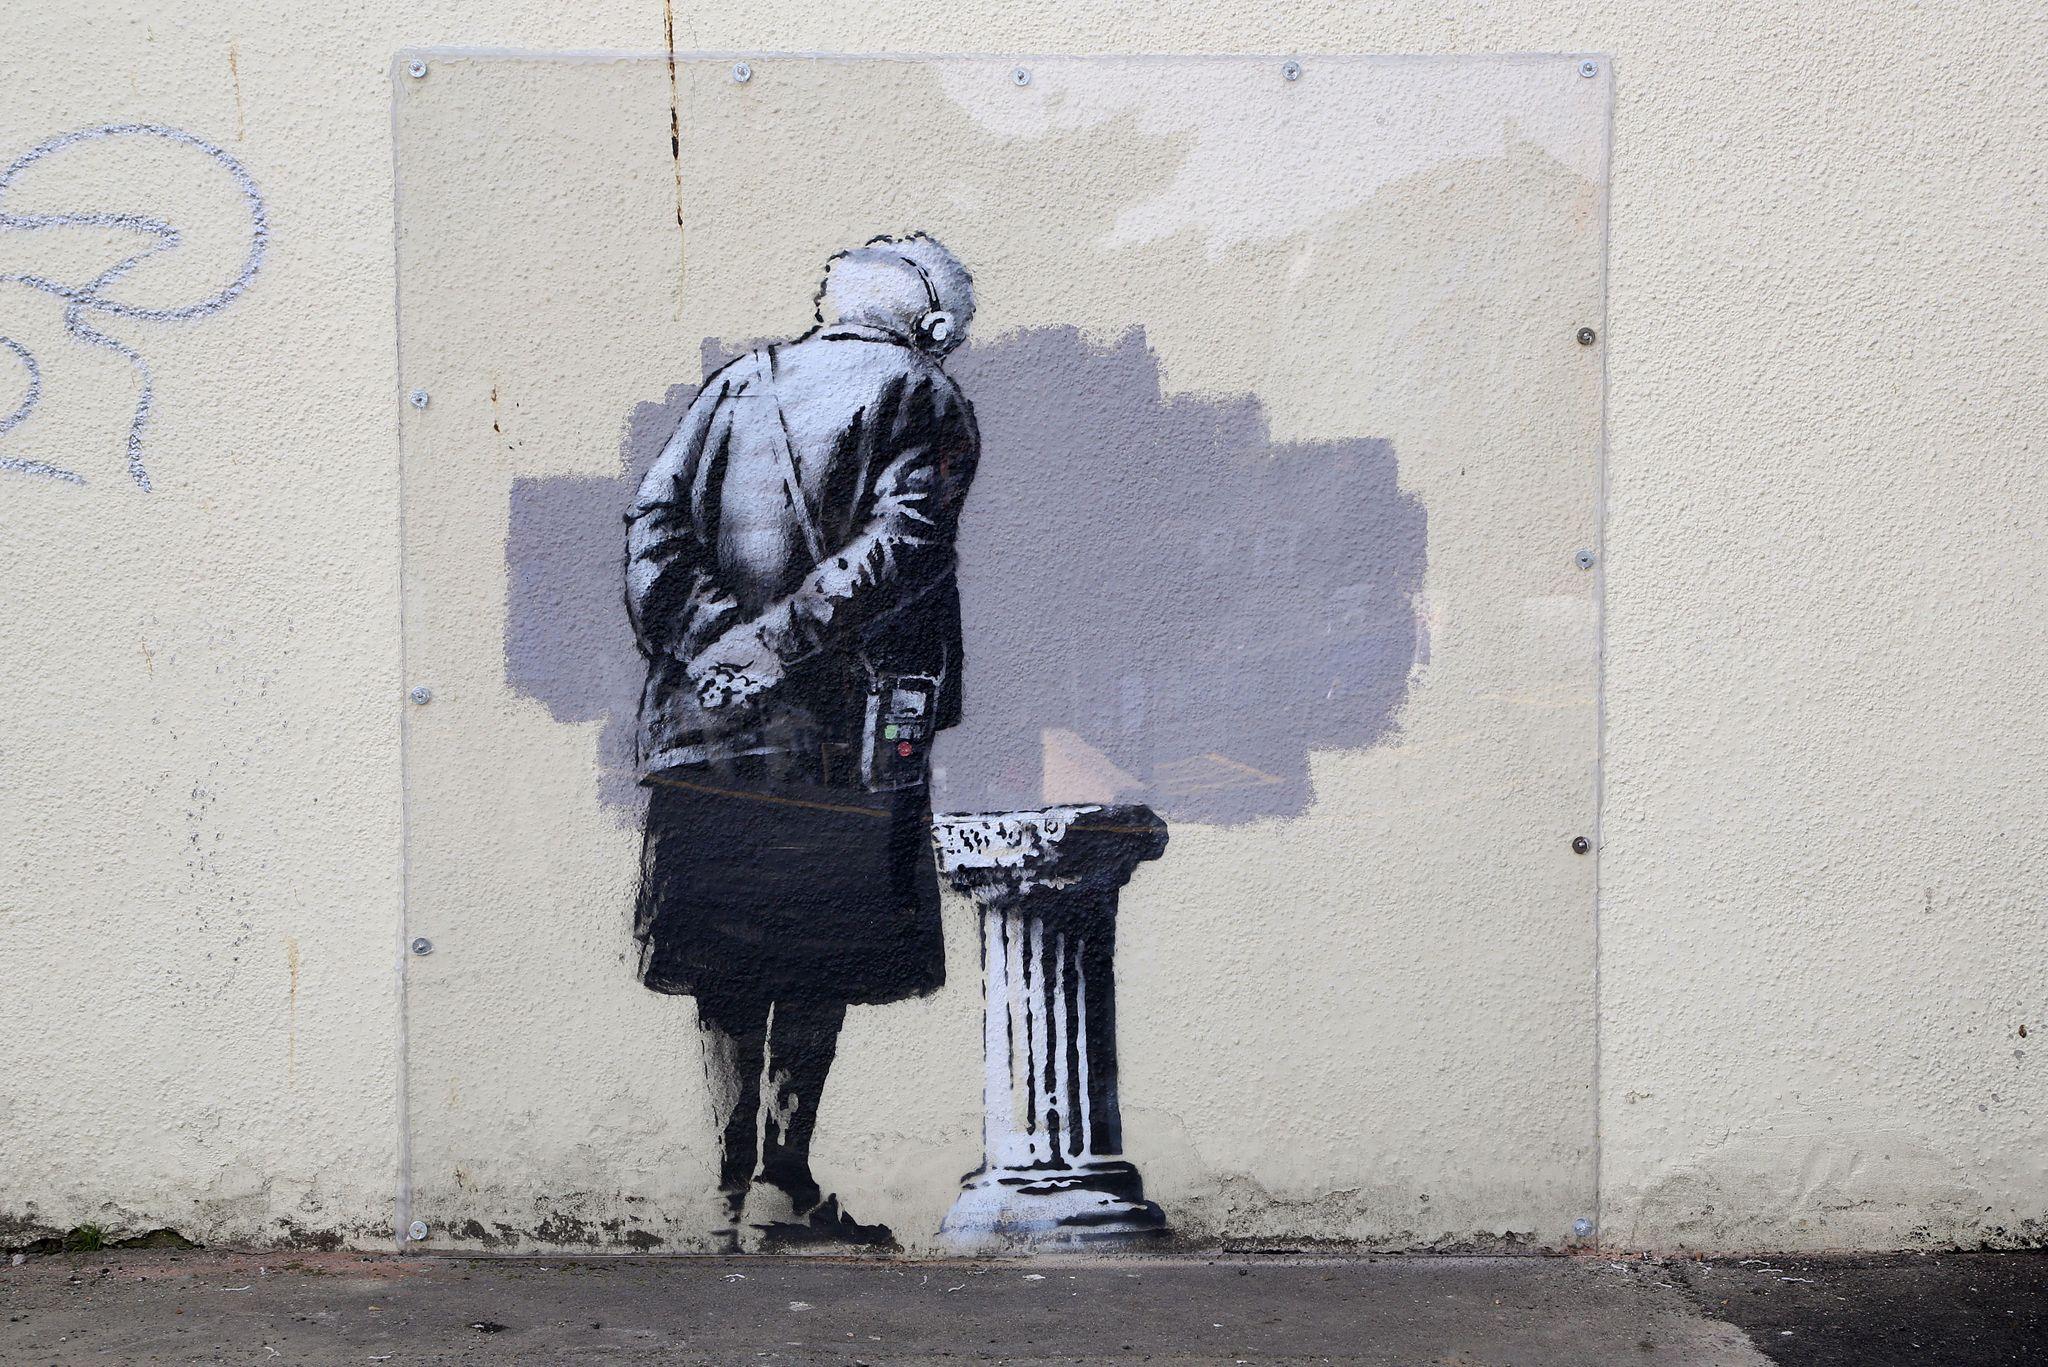 Murales di Bansksy danneggiato dai vandali a Folkestone, in Inghilterra